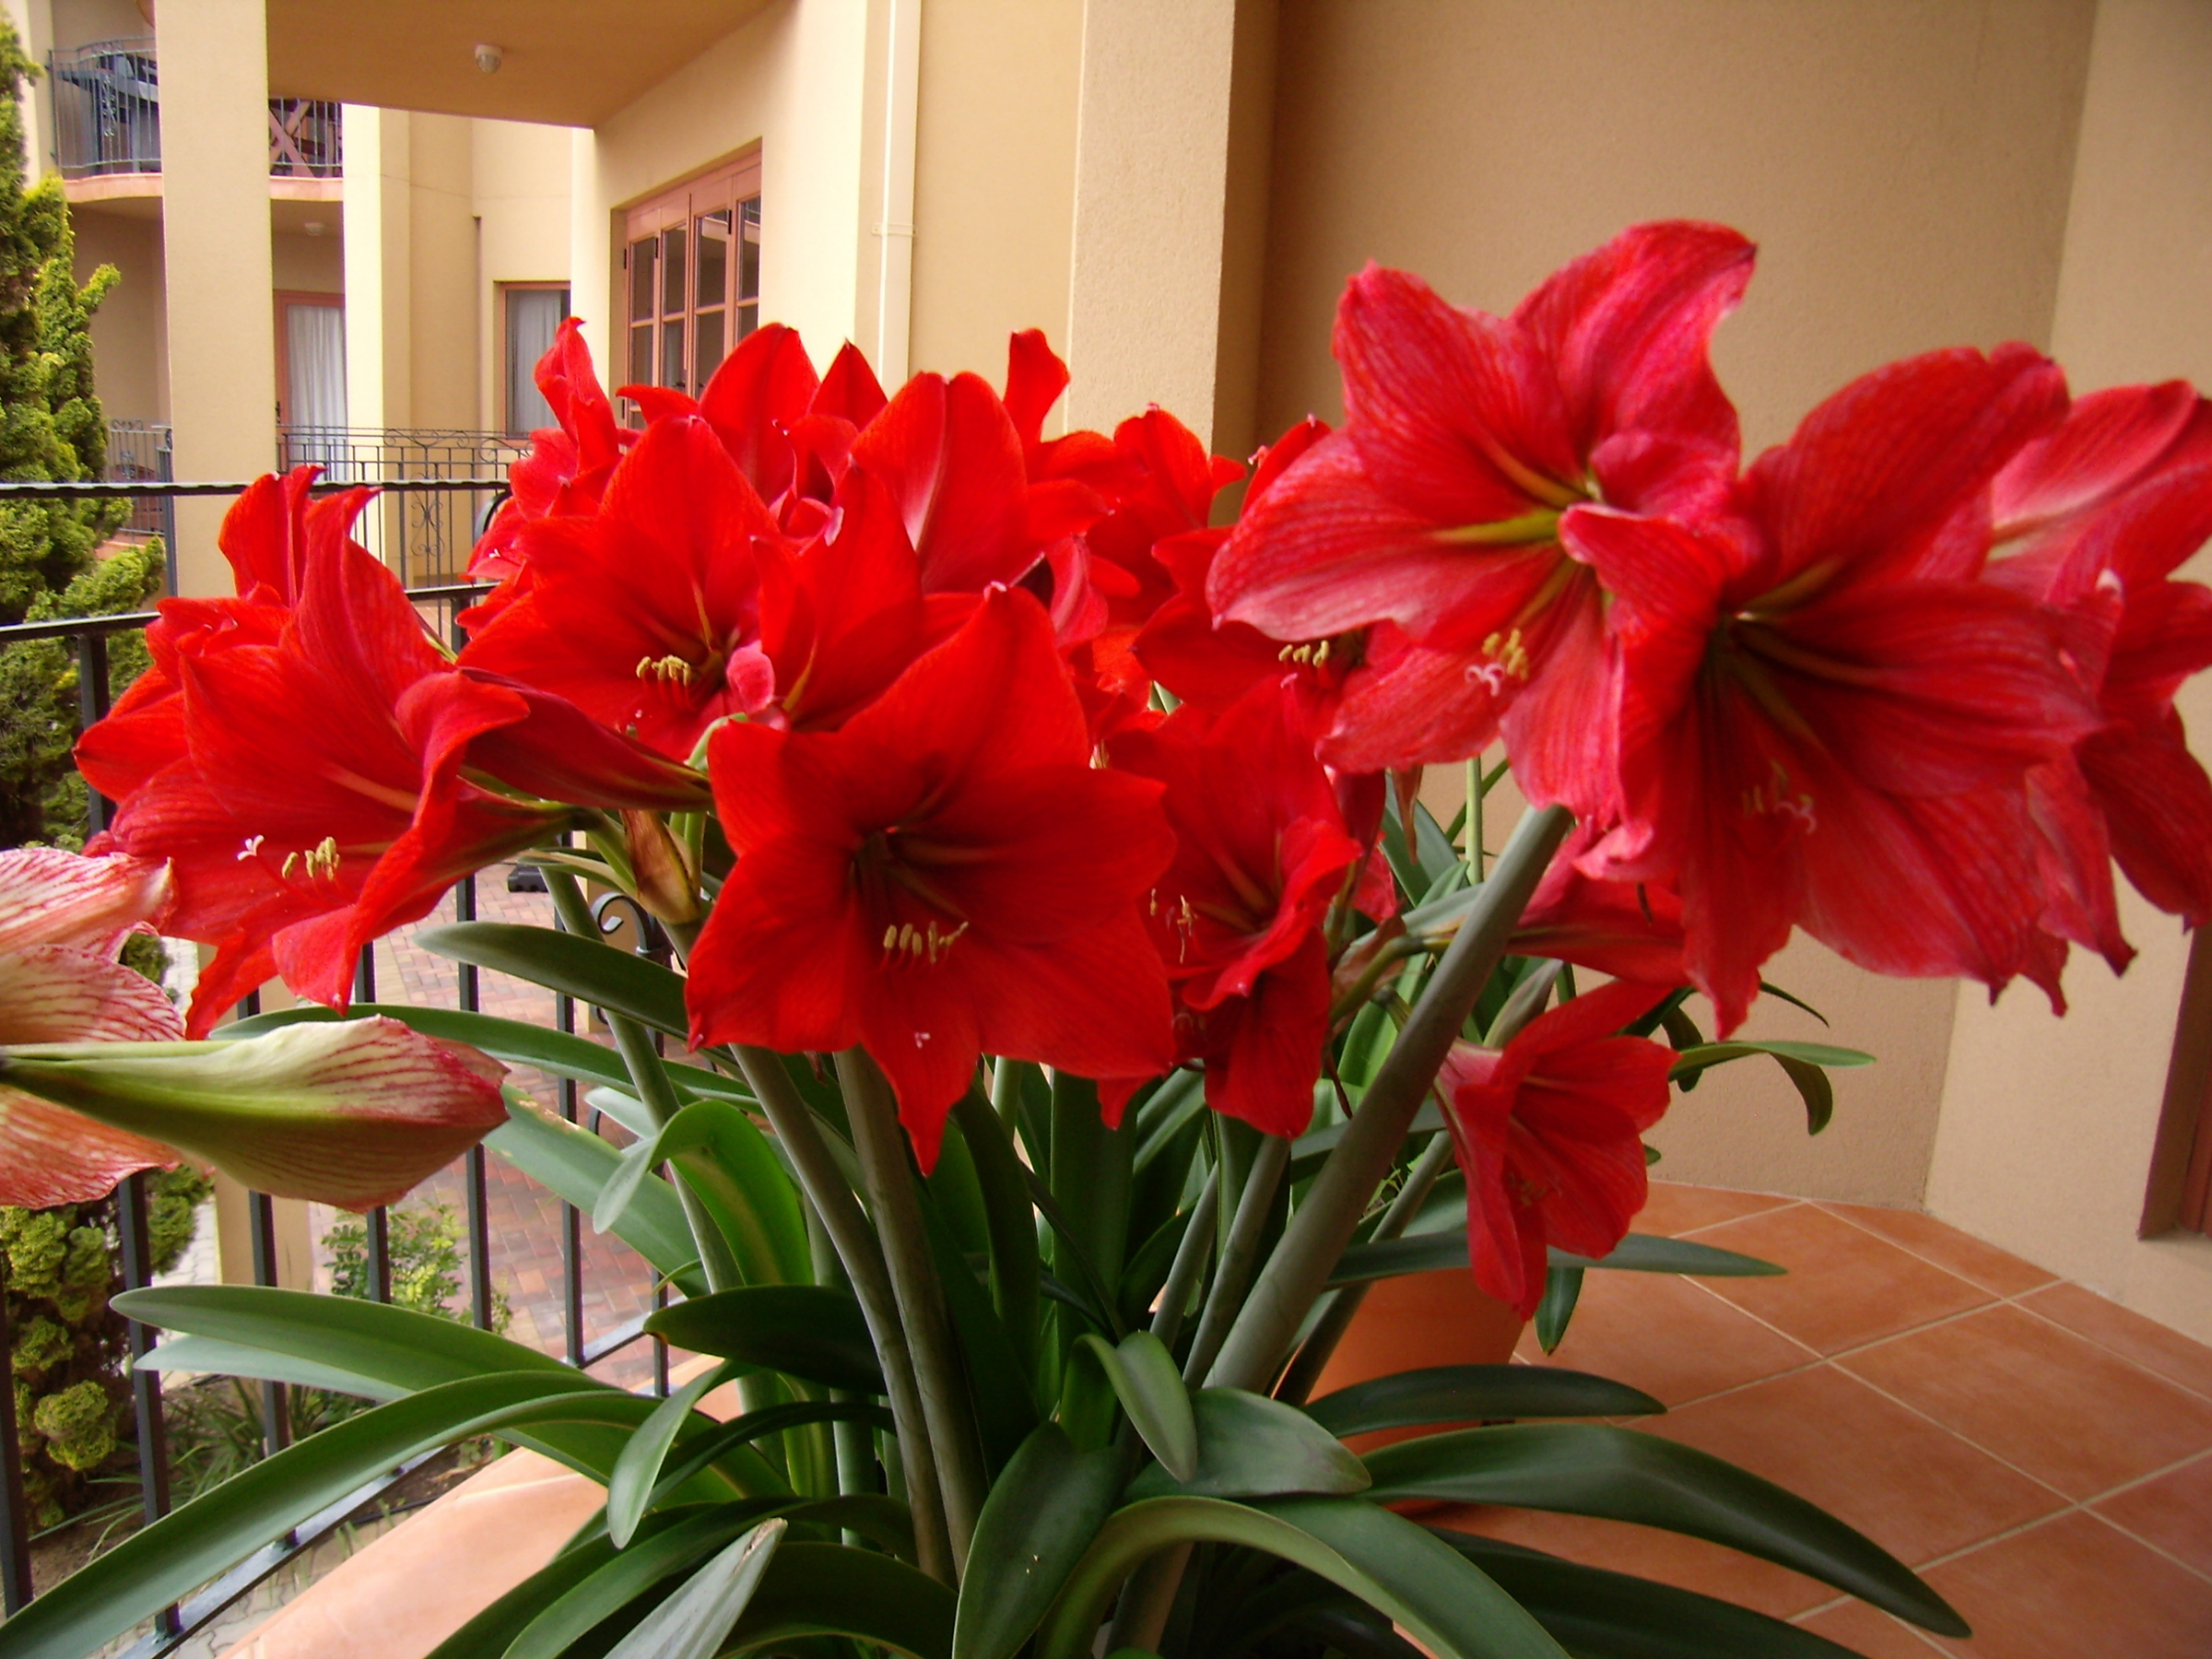 Цветы гузмания. Уход в домашних условиях за гузманией комнатной. Цветок гузмания минор, гузмания рондо: размножение, пересадка, цветение, детки. Растение гузмания.